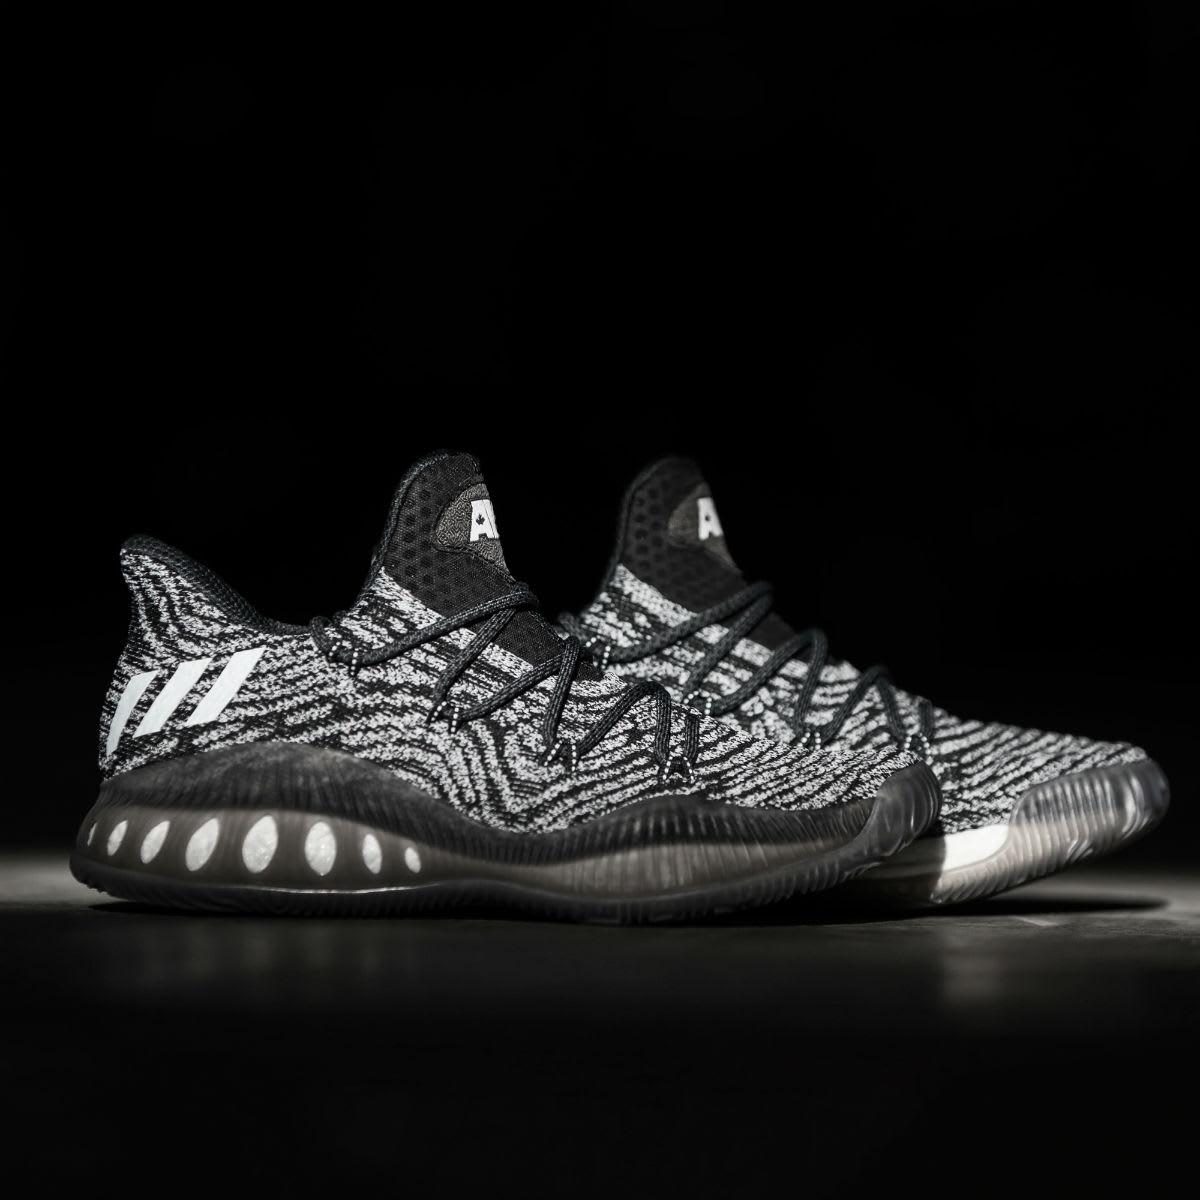 Andrew Wiggins Adidas Crazy Explosive Low Wolf Grey Profile